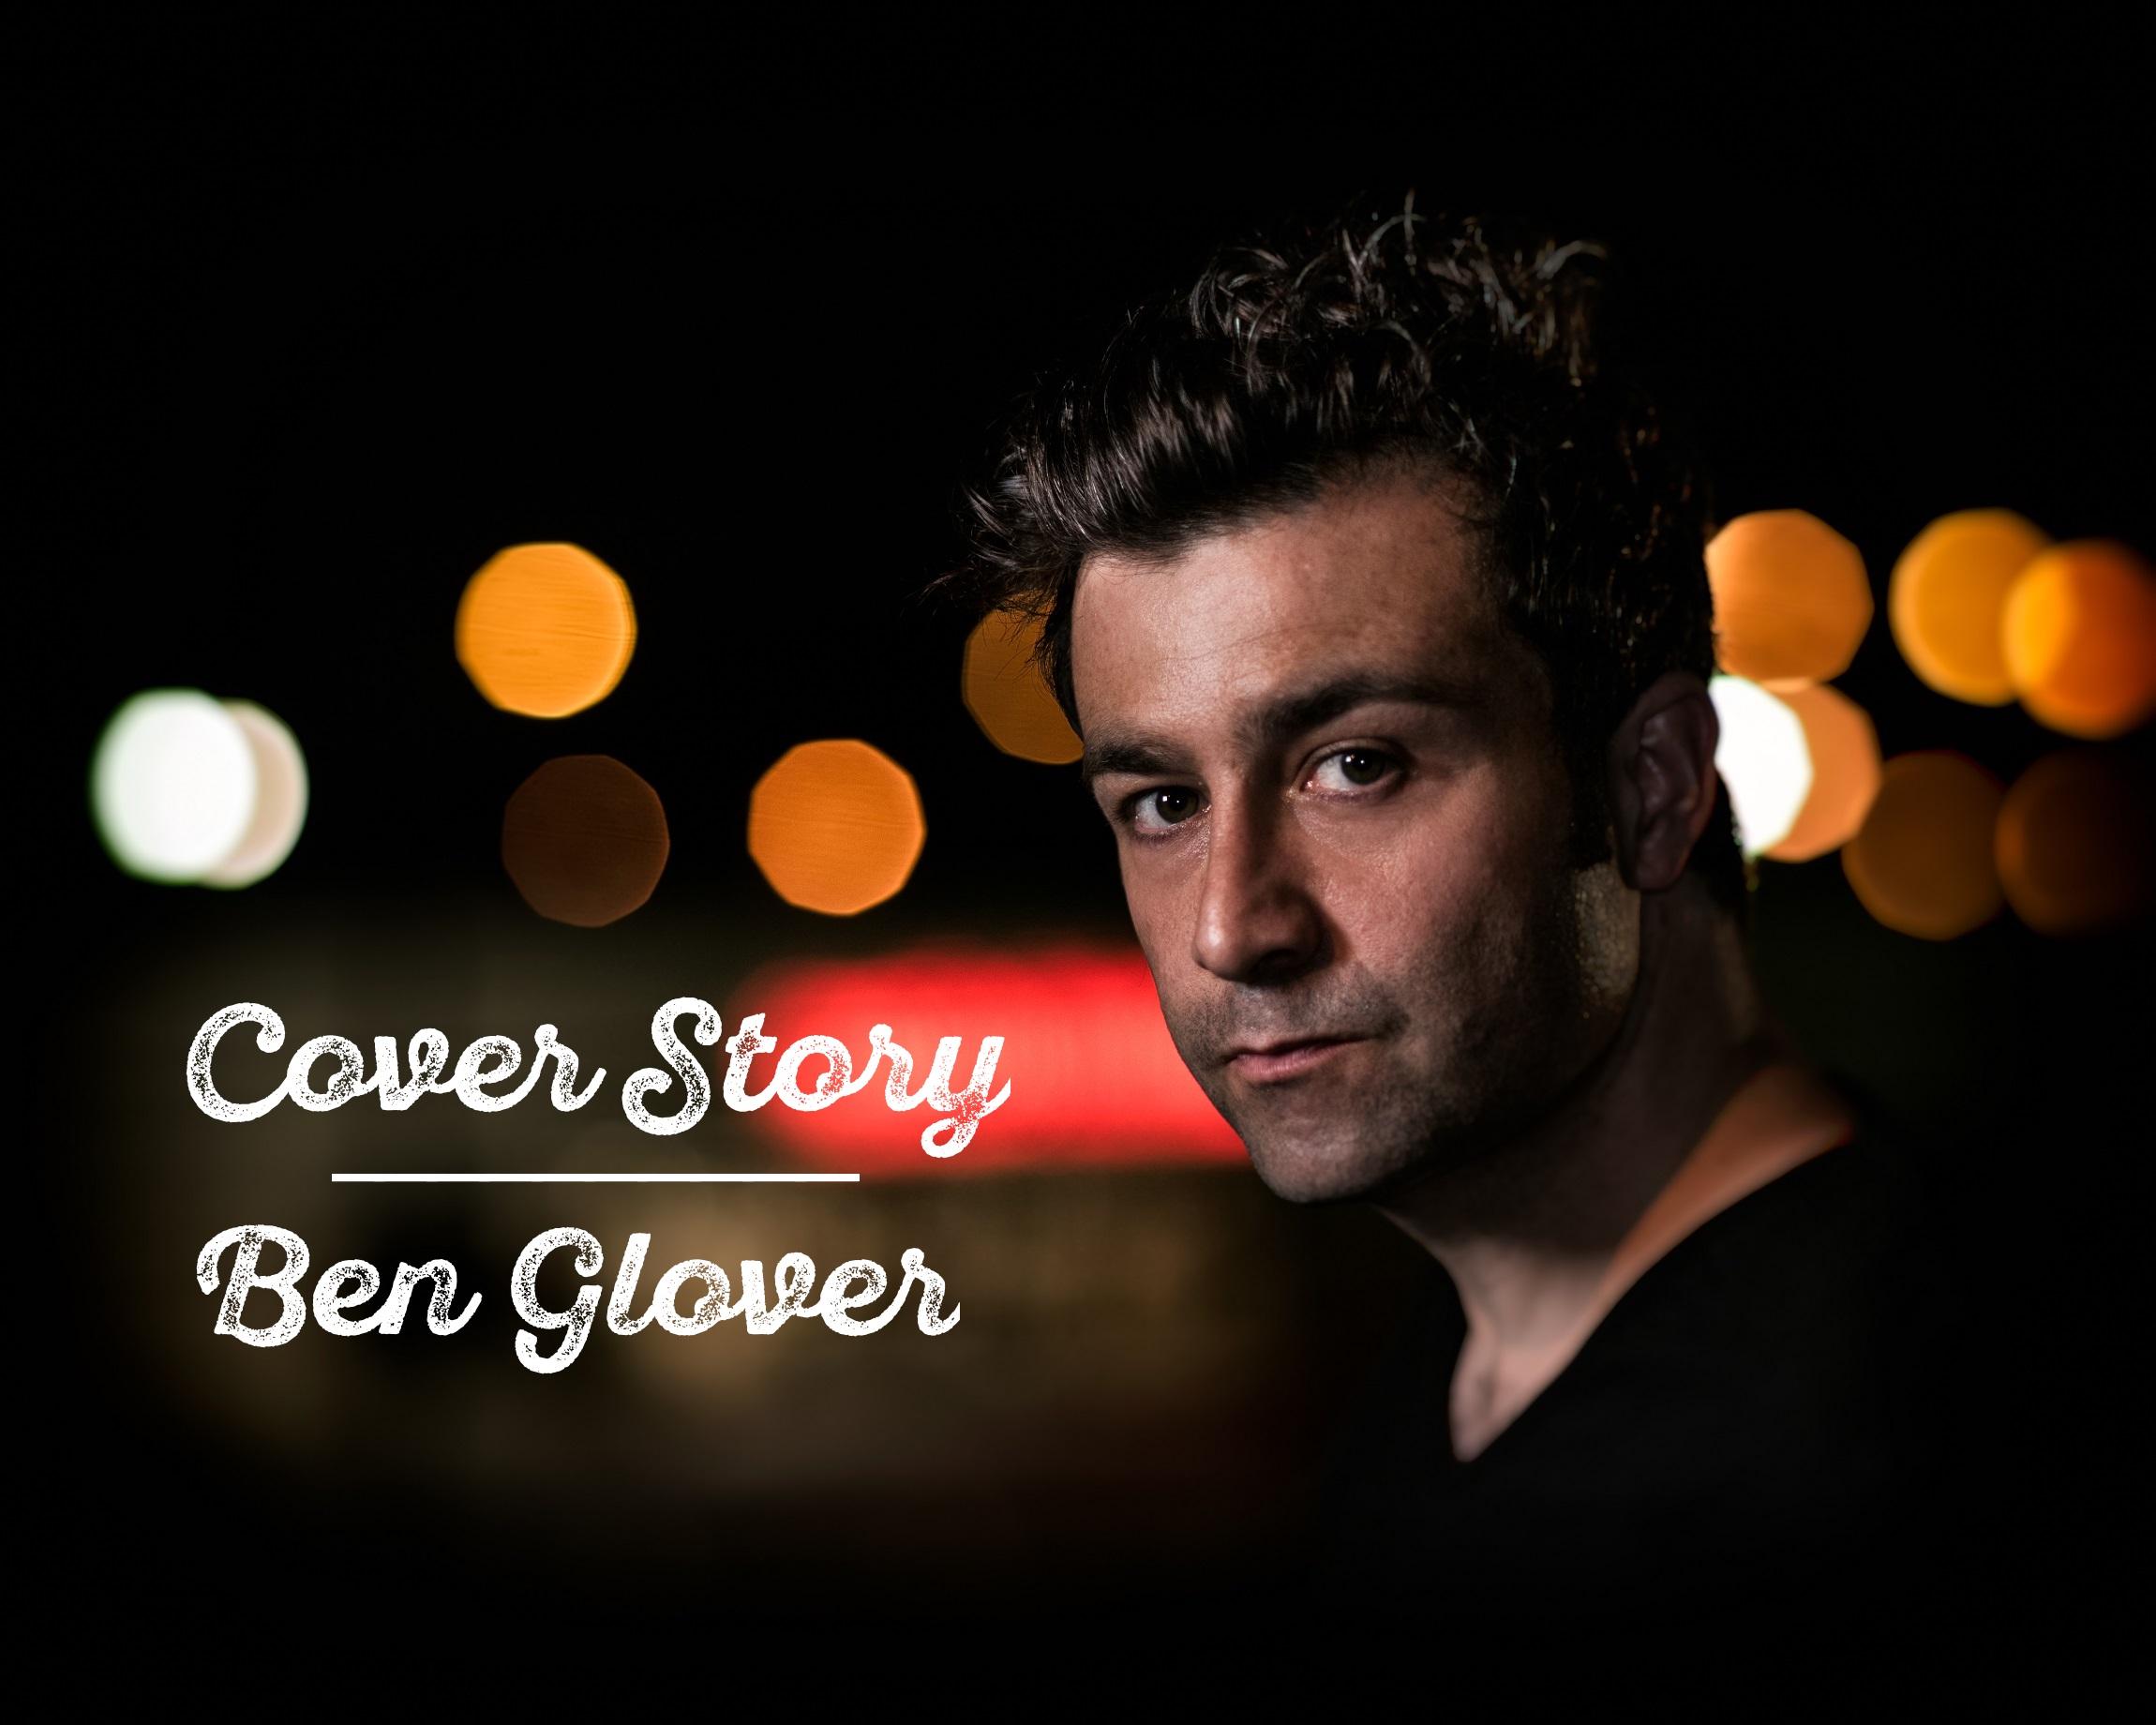 Ben Glover: The Restless Spirit Finds His Shore